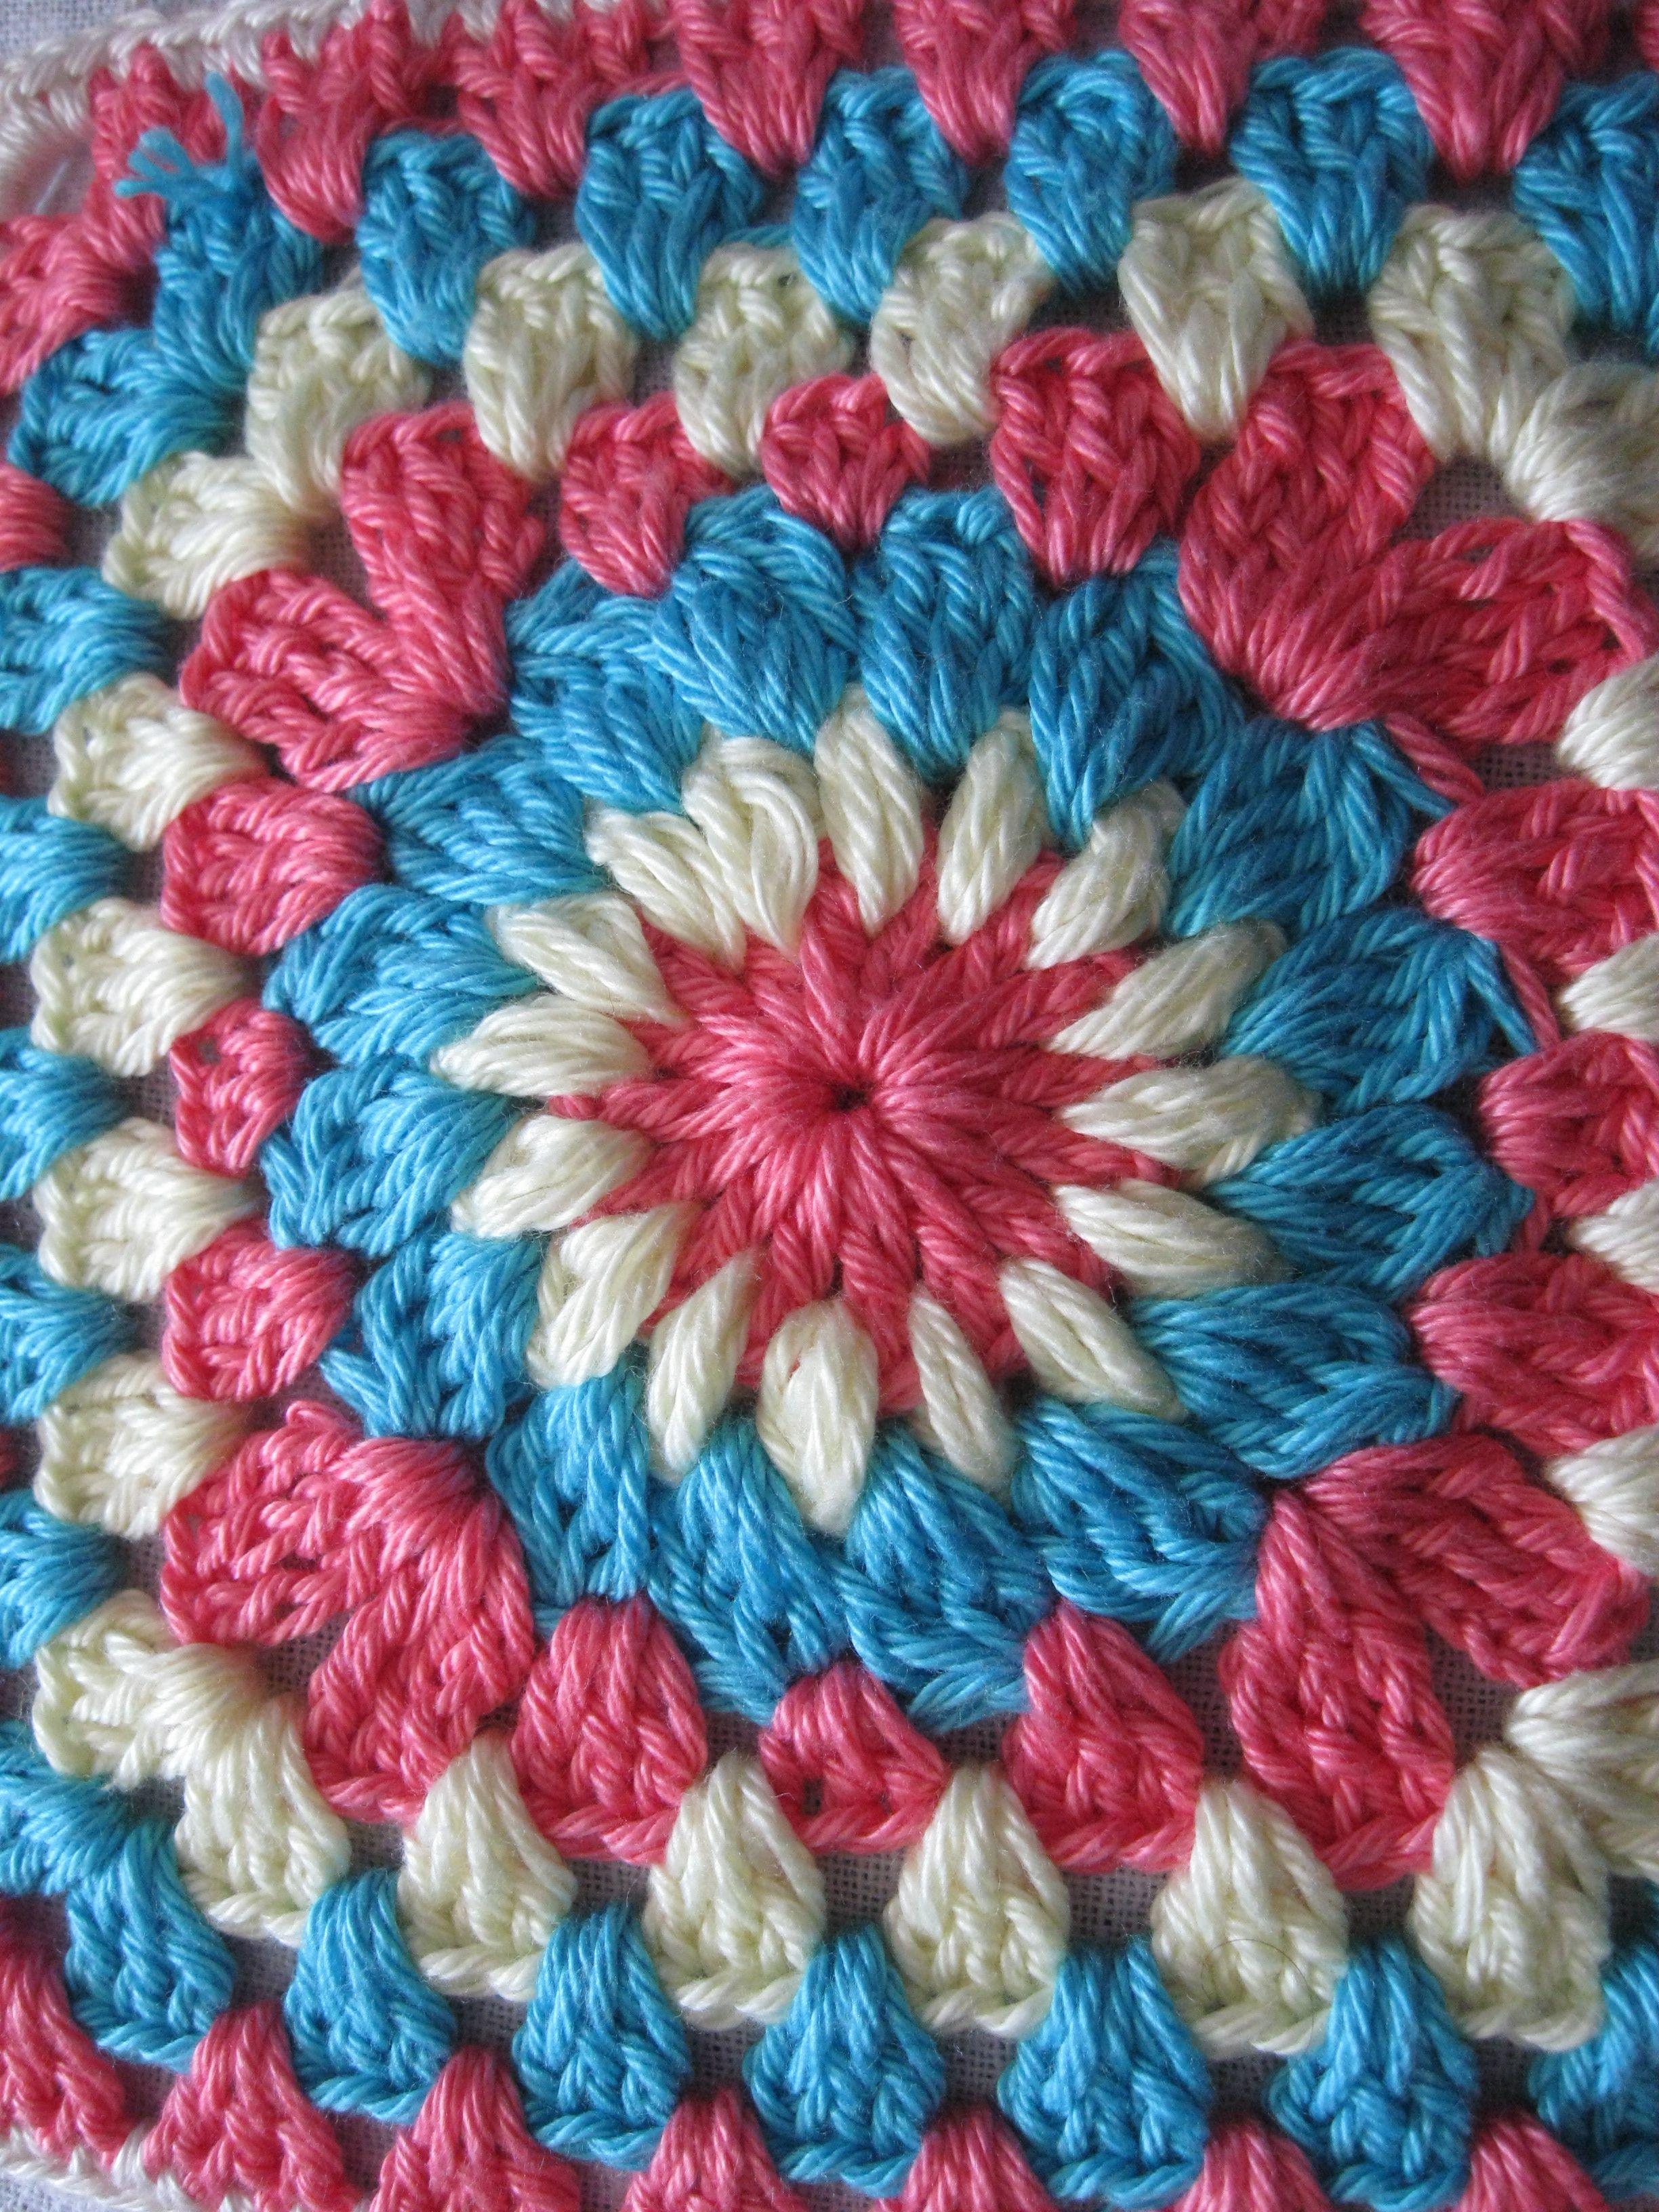 granny square crochet pattern | ... pattern is Priscilla Hewitt\'s ...